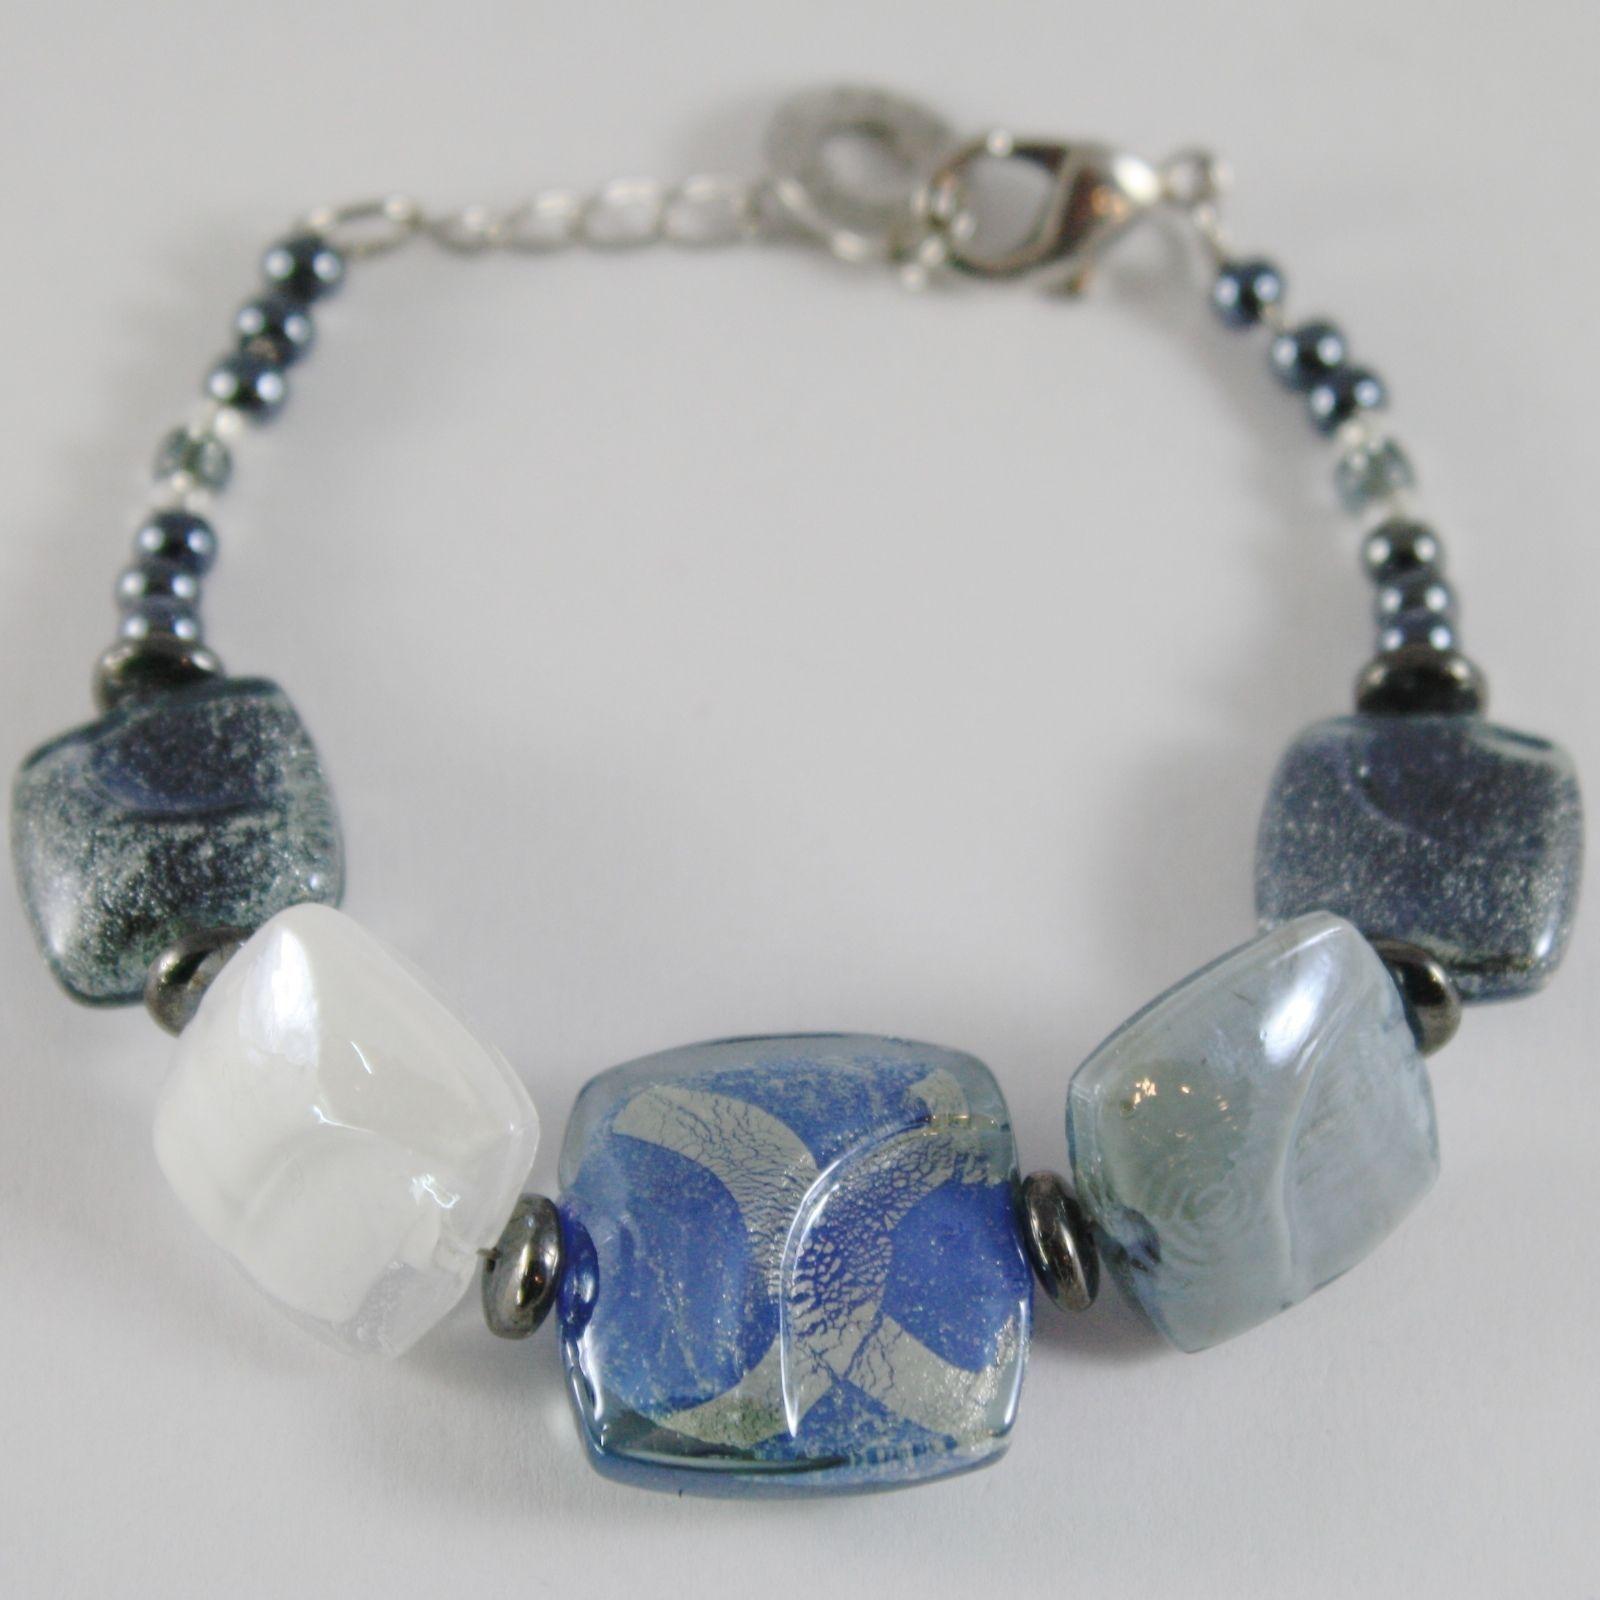 BRACELET ANTICA MURRINA VENEZIA WITH MURANO GLASS BLUE GREY WHITE BR729A06